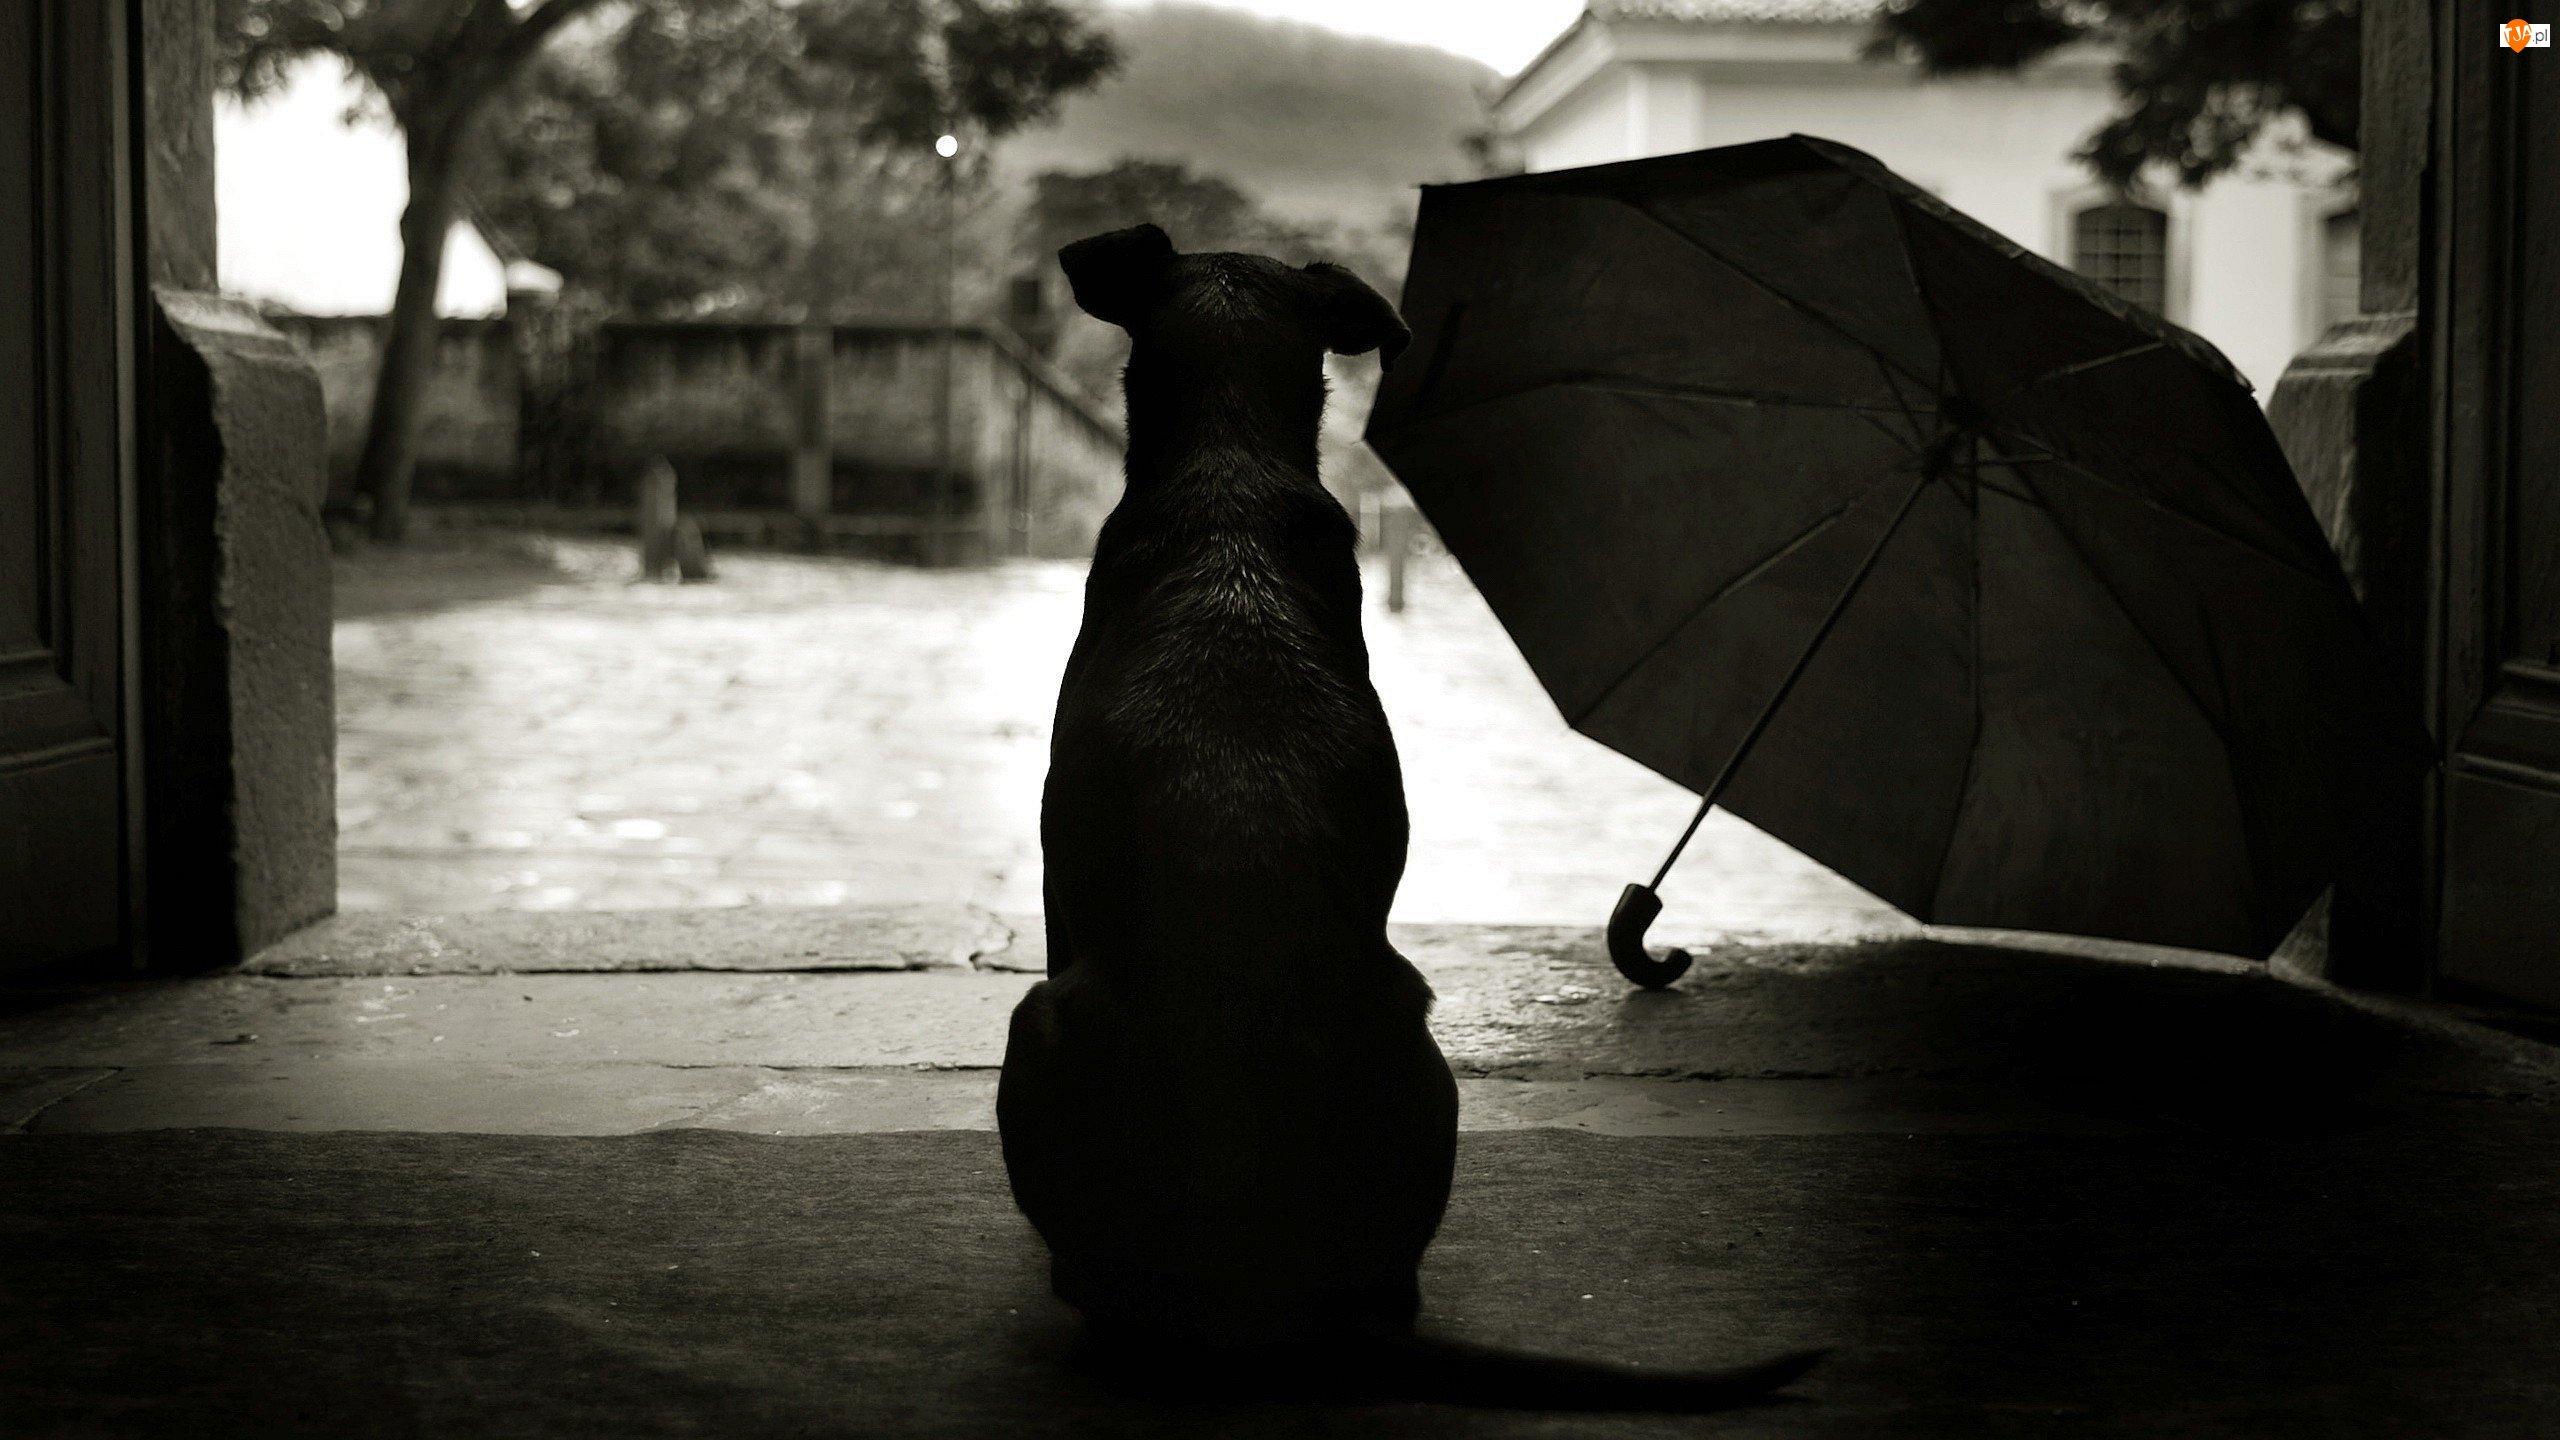 Pies, Parasol